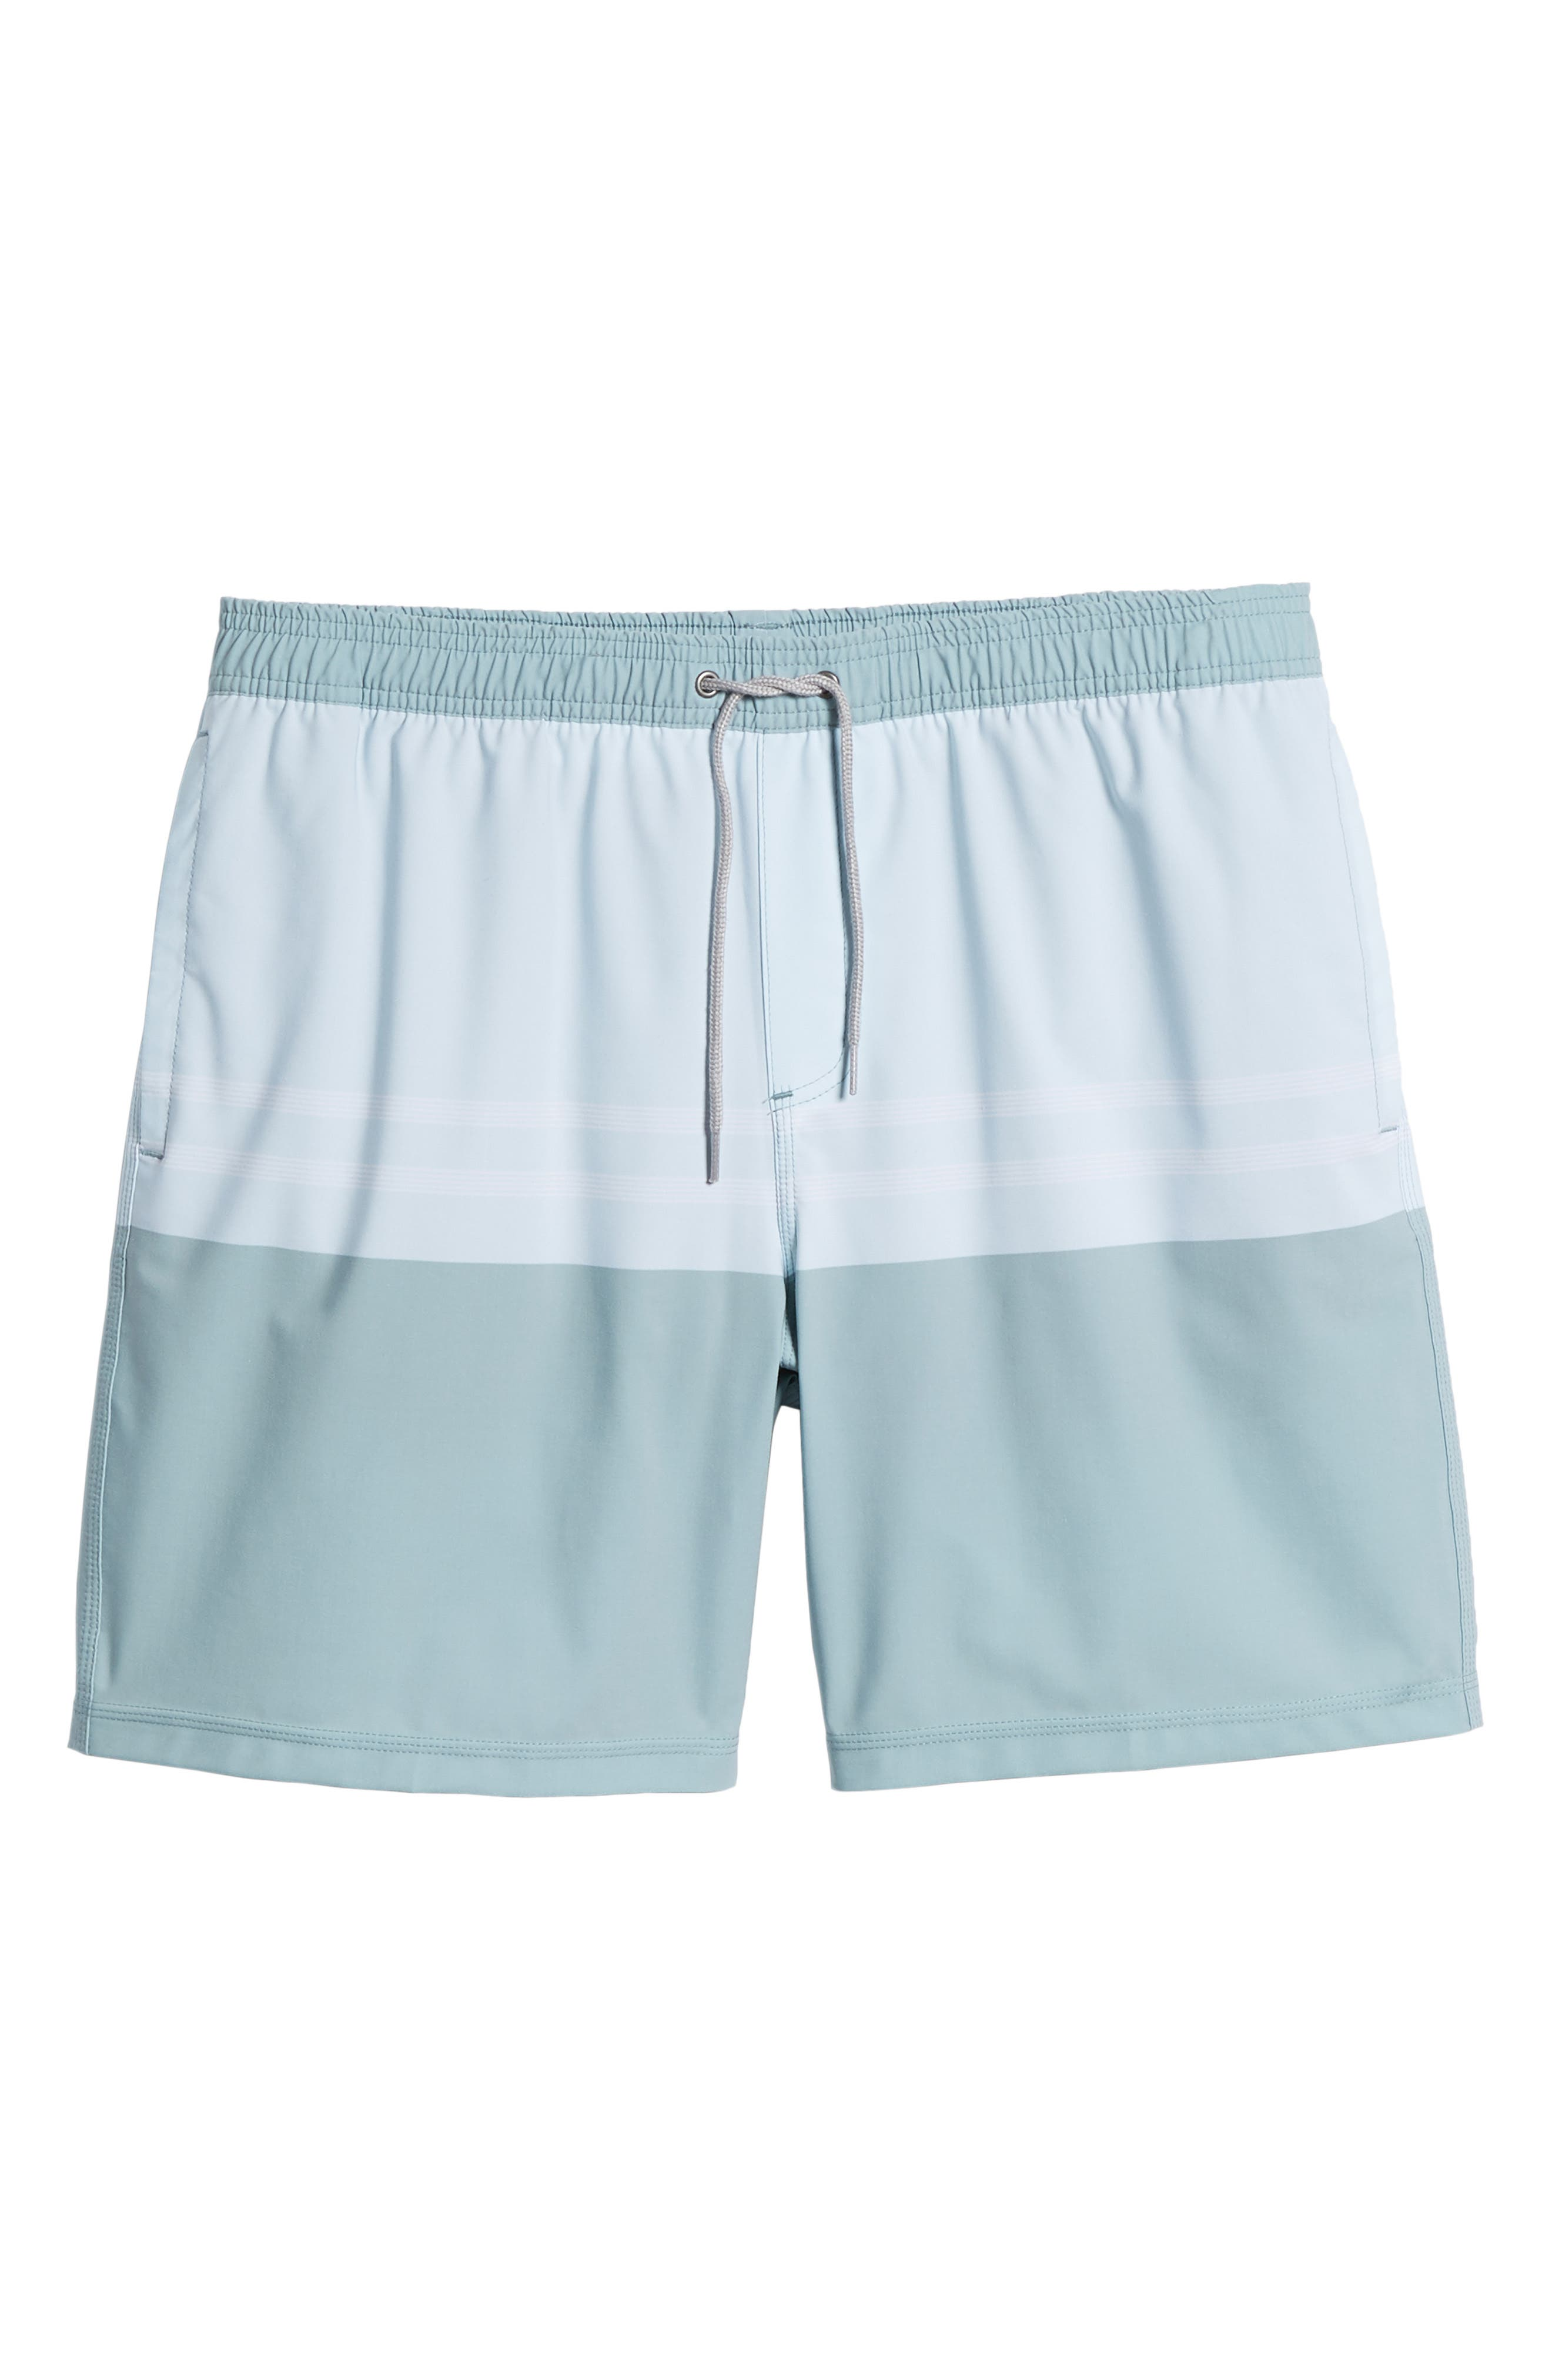 Pier Board Shorts,                             Alternate thumbnail 18, color,